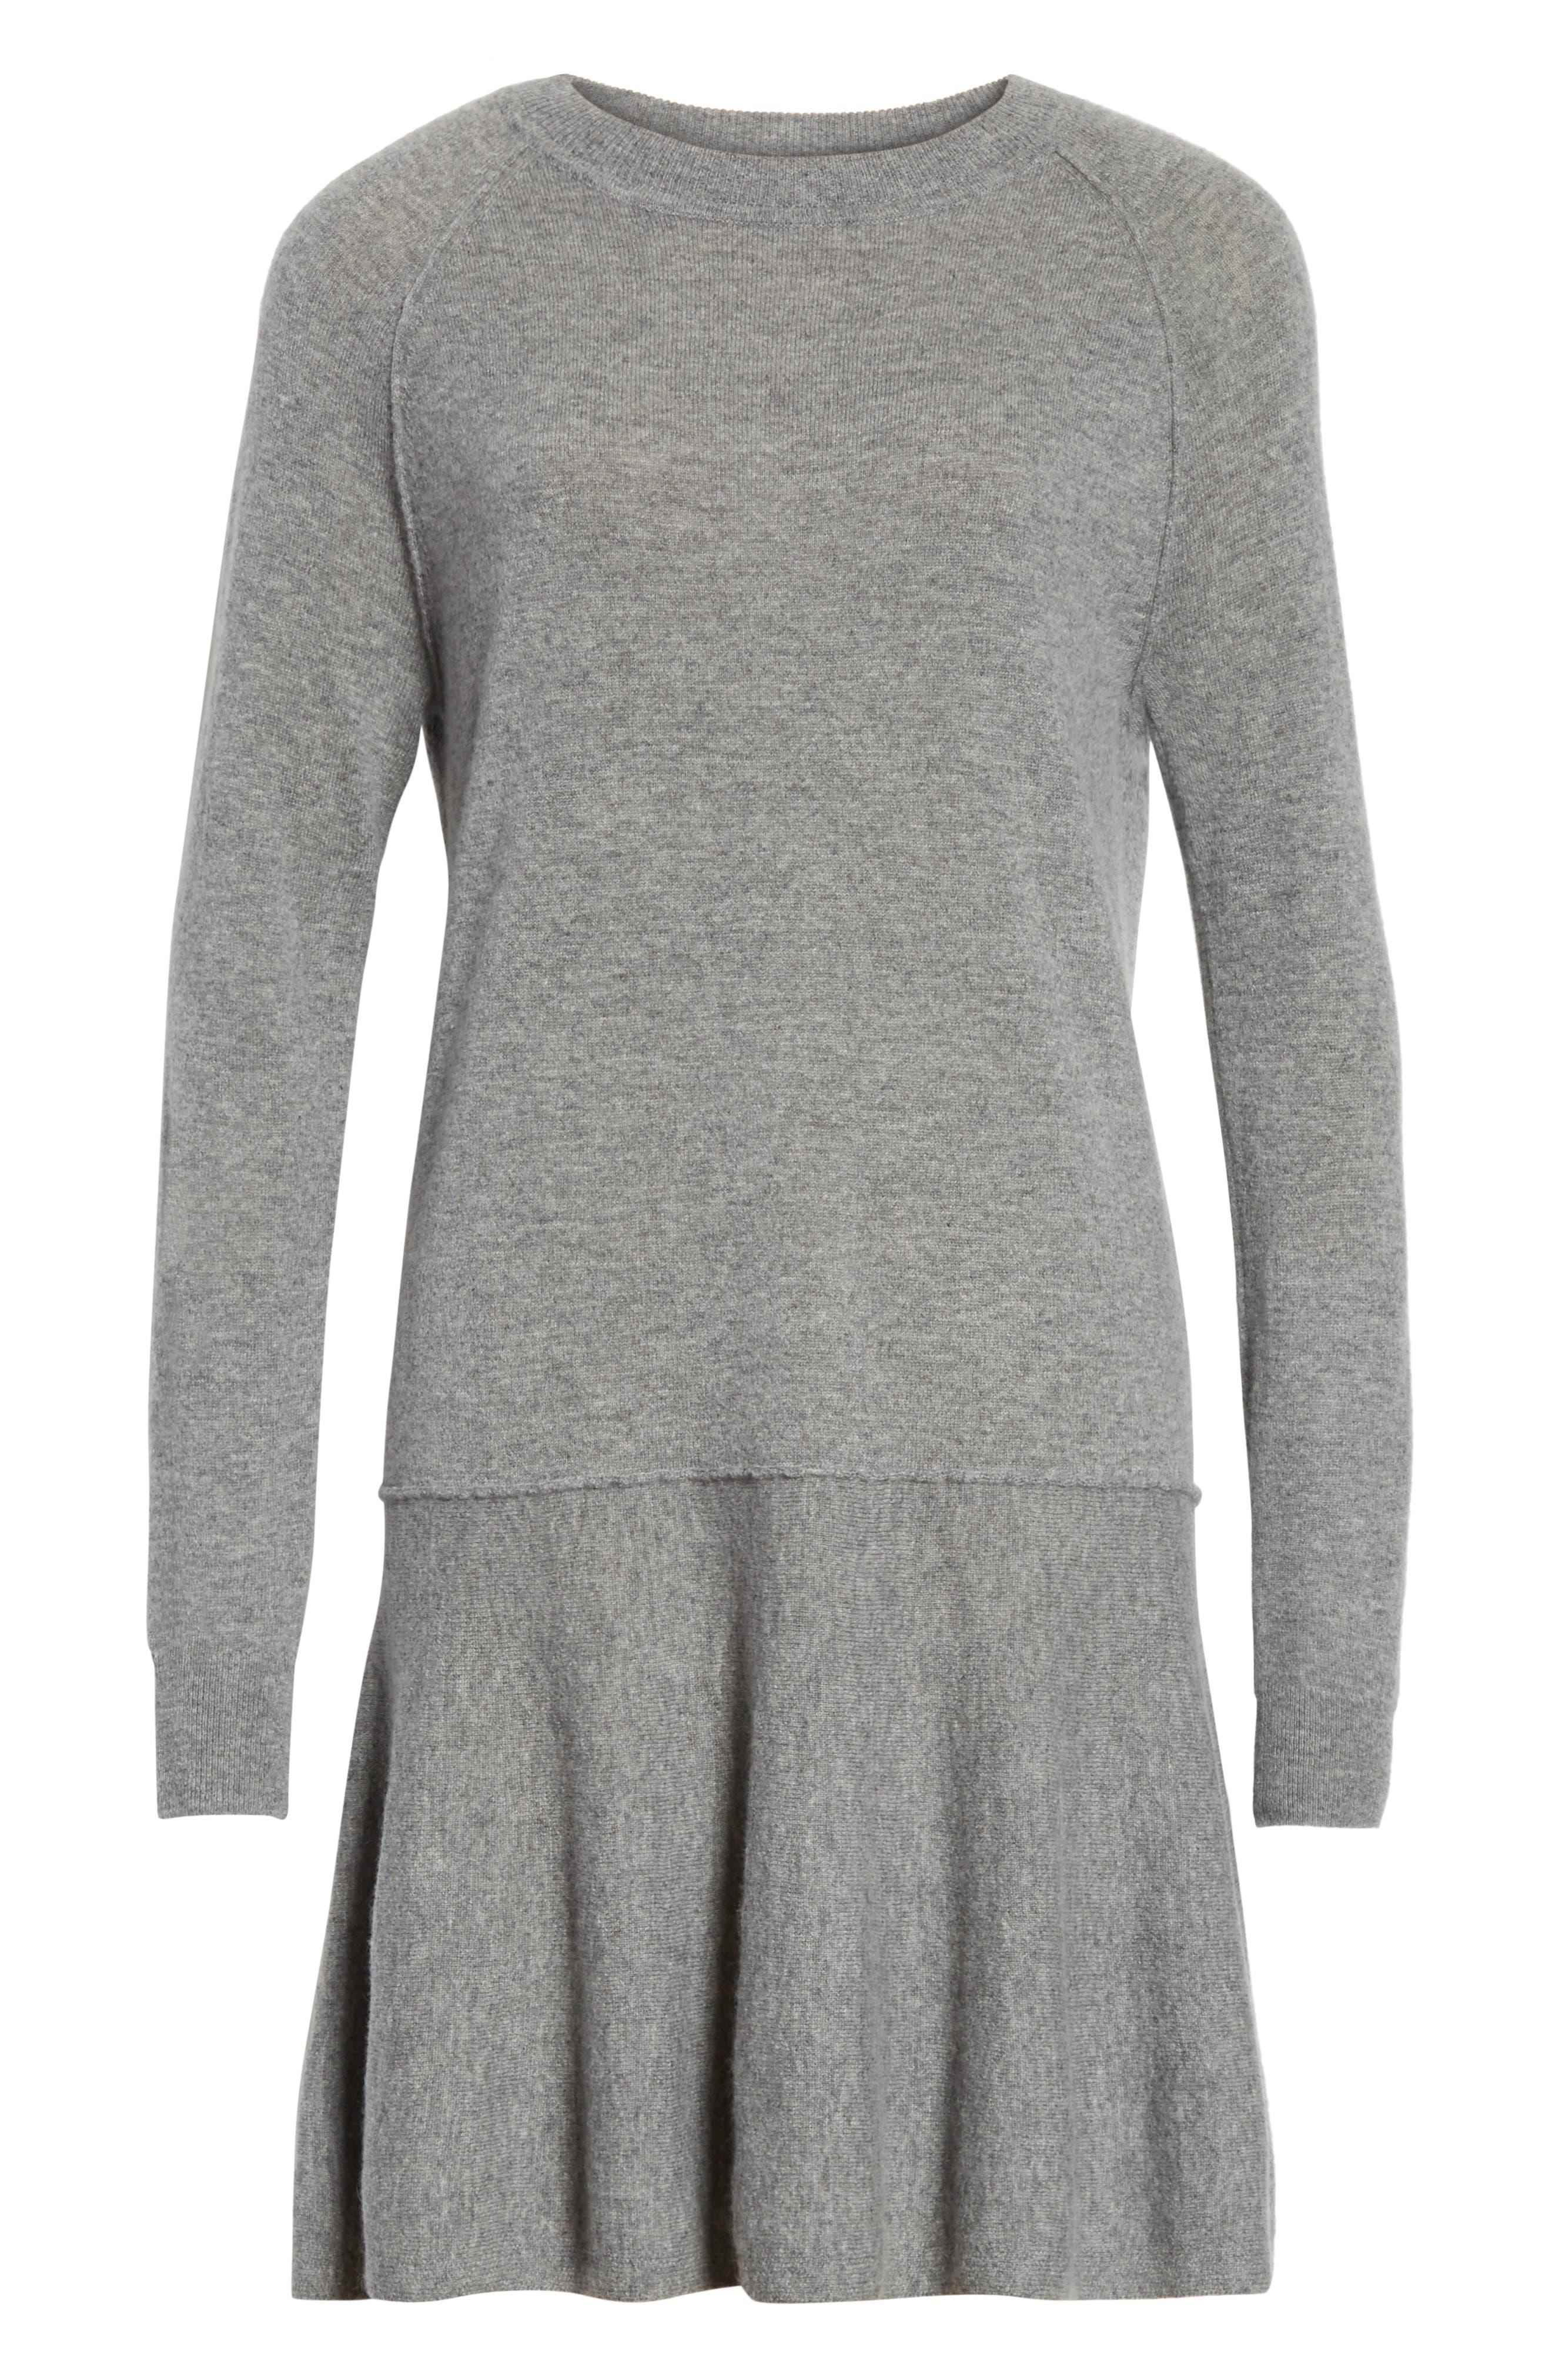 Cashmere Drop Waist Sweater Dress,                             Alternate thumbnail 6, color,                             027